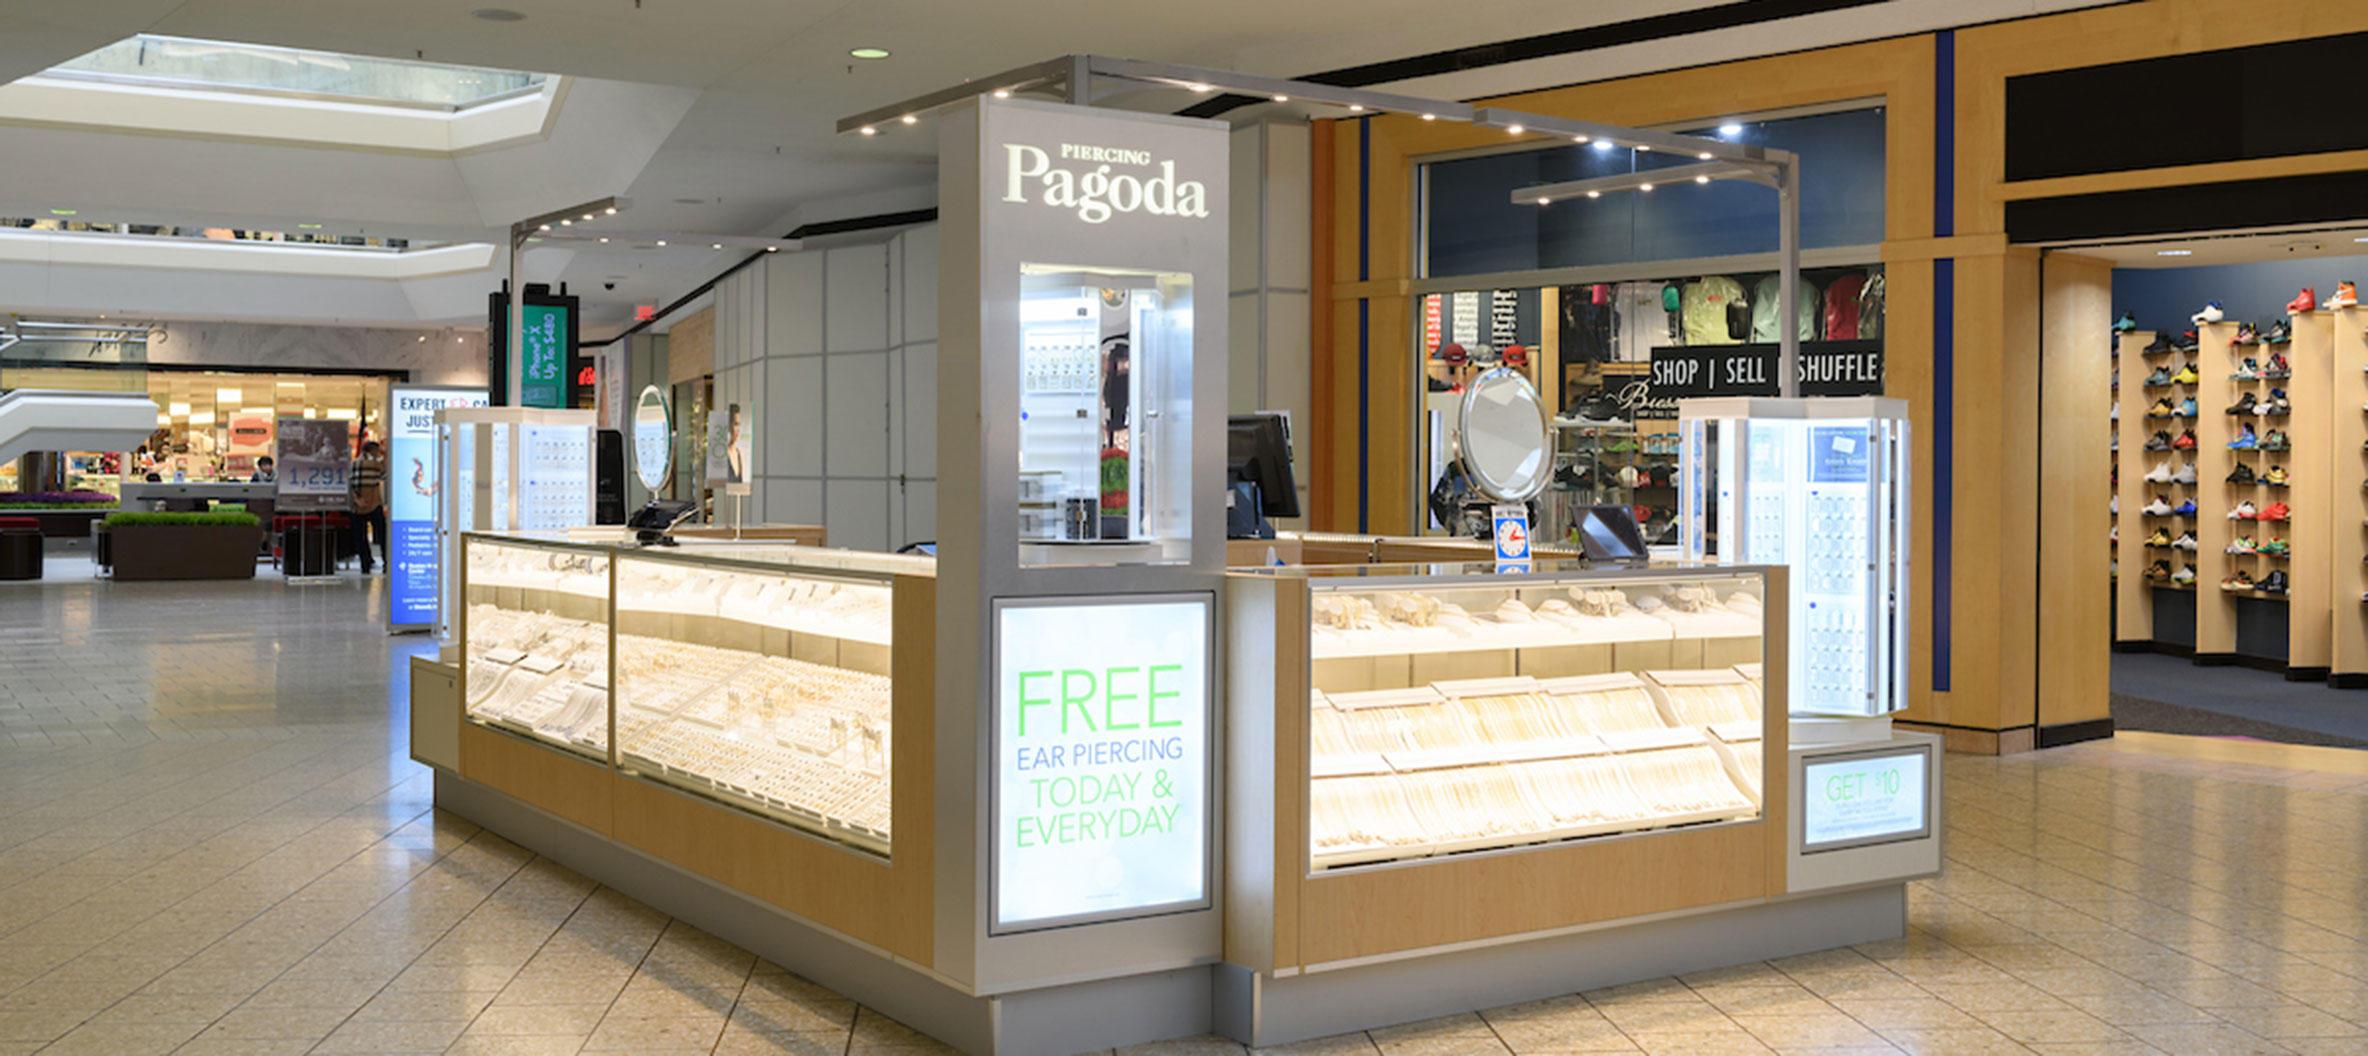 191dab0f5 Piercing Pagoda 900 Commons Dr, Dothan, AL 36303 - YP.com